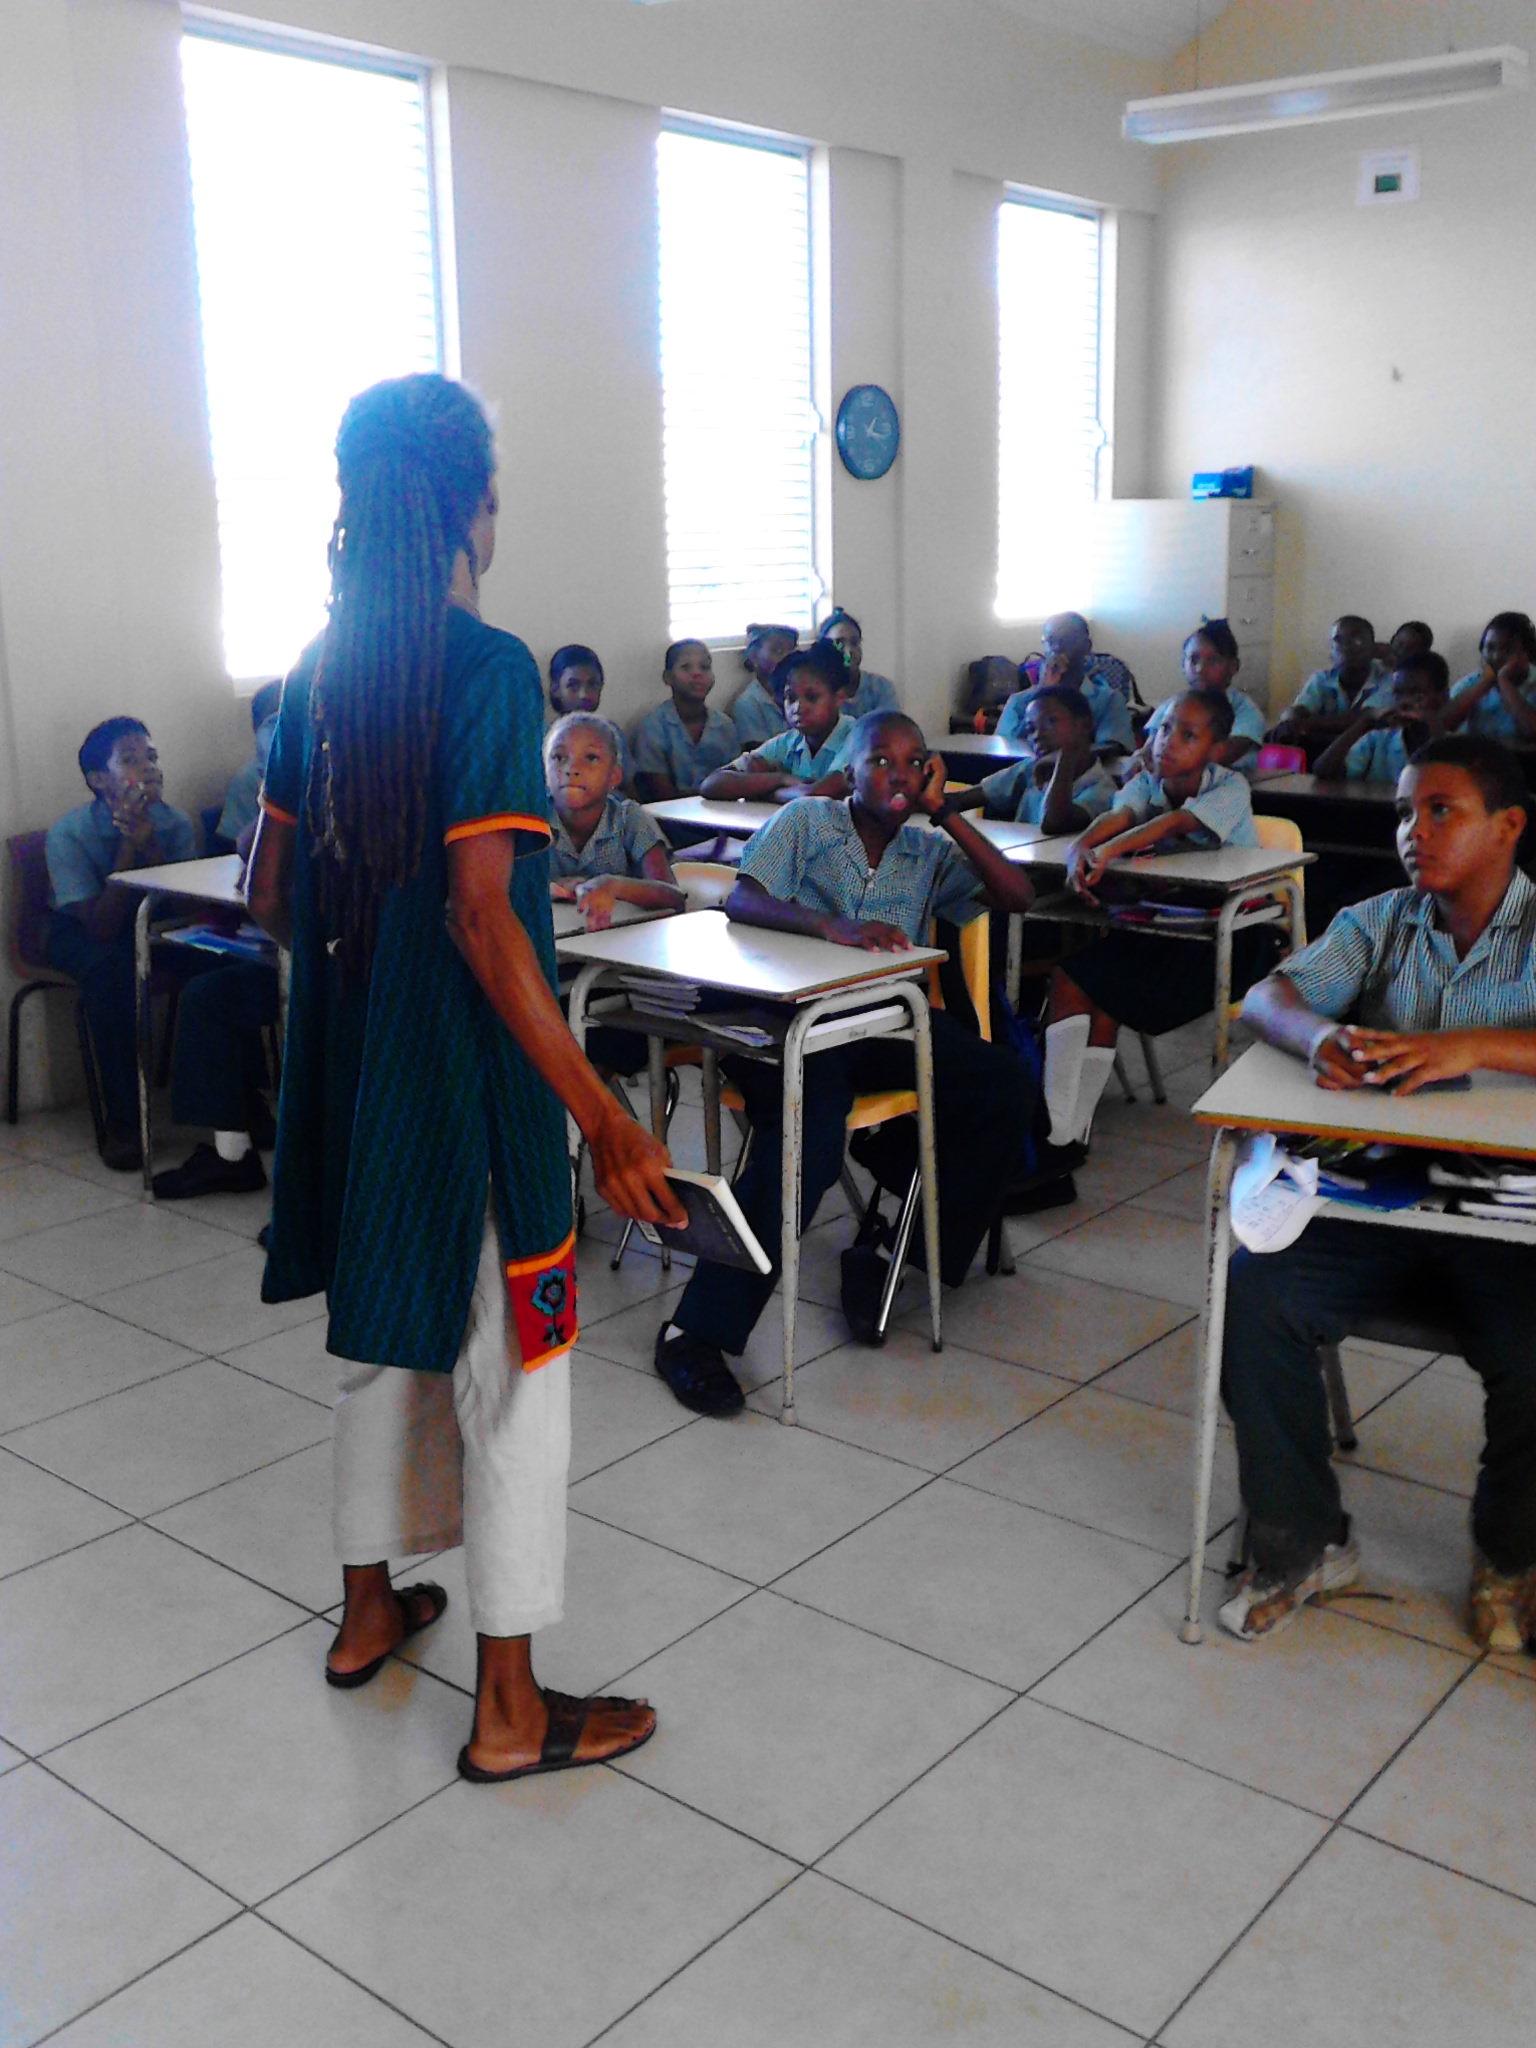 A-dZiko presenting to children at Brade's Primary School